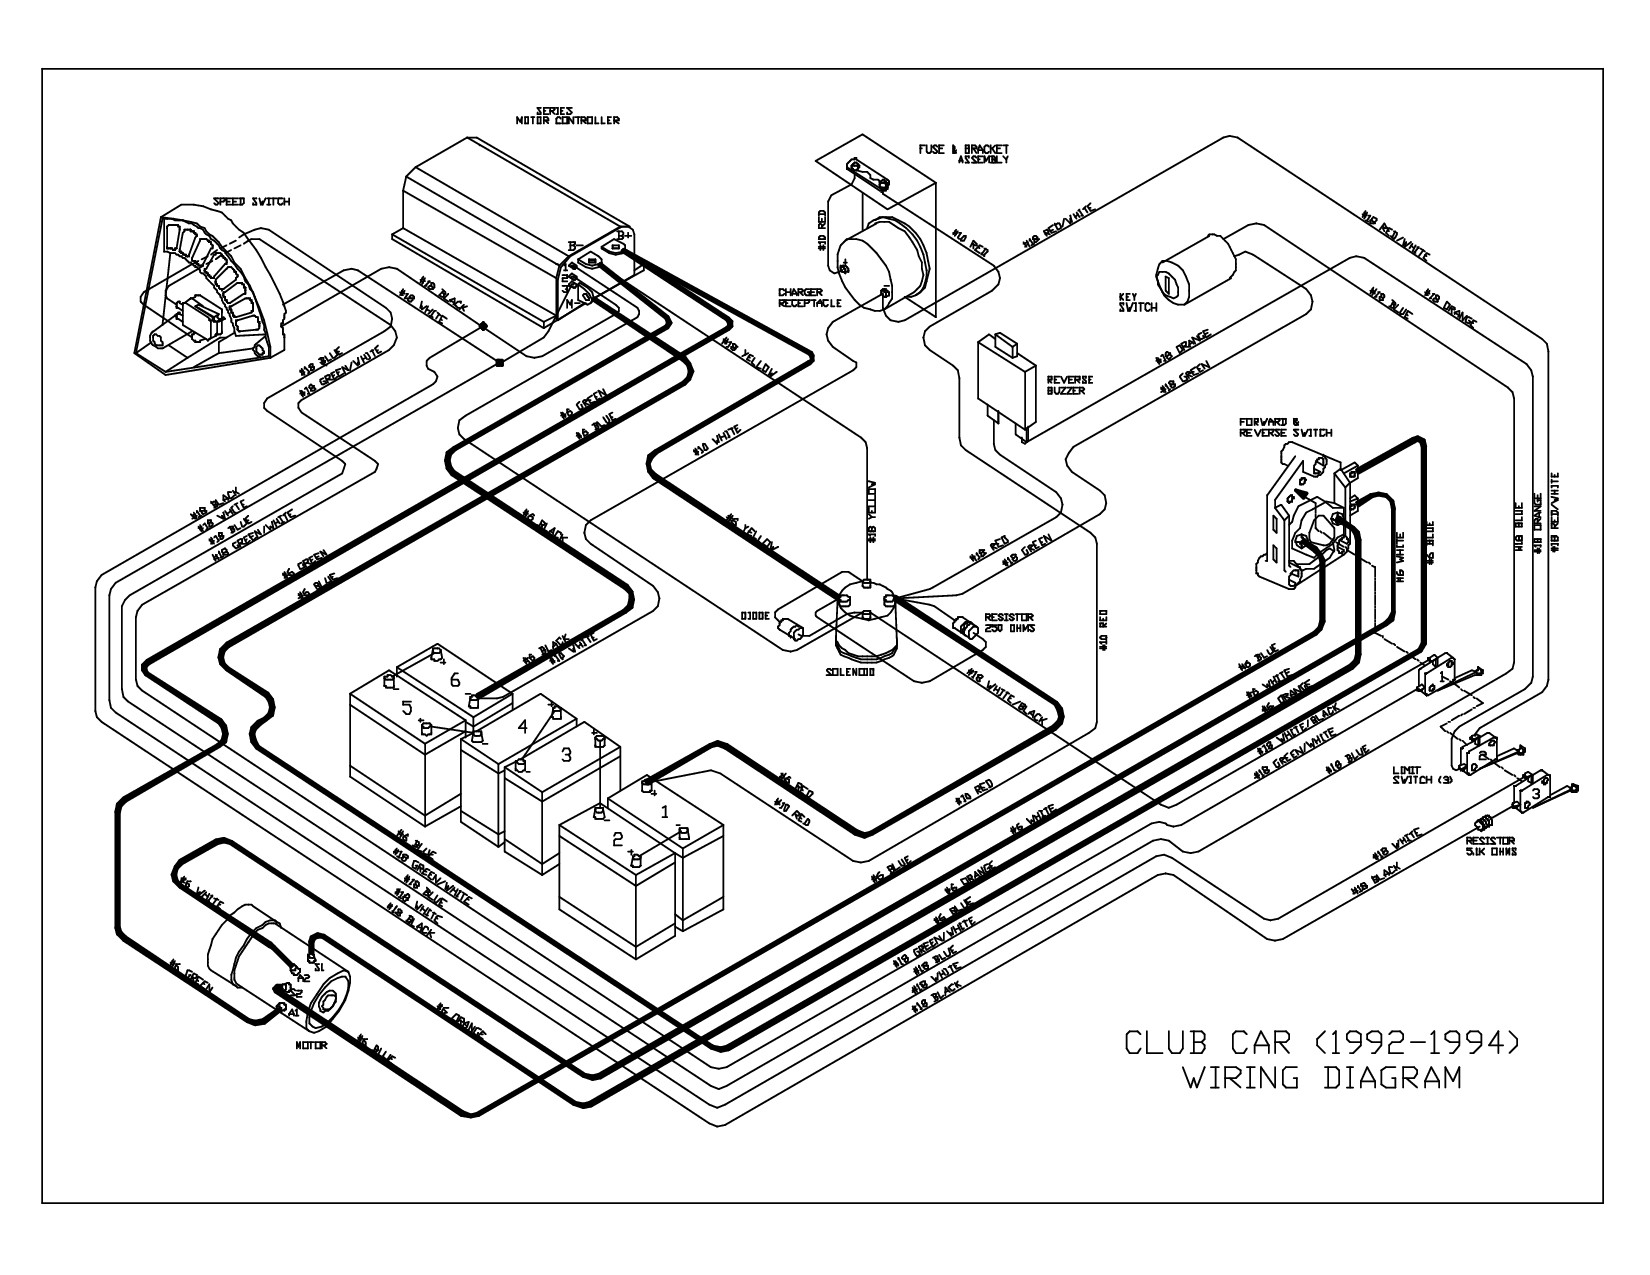 1992 honda accord engine diagram automotive wiring diagram 1992 honda accord wiring diagram speed of 1992